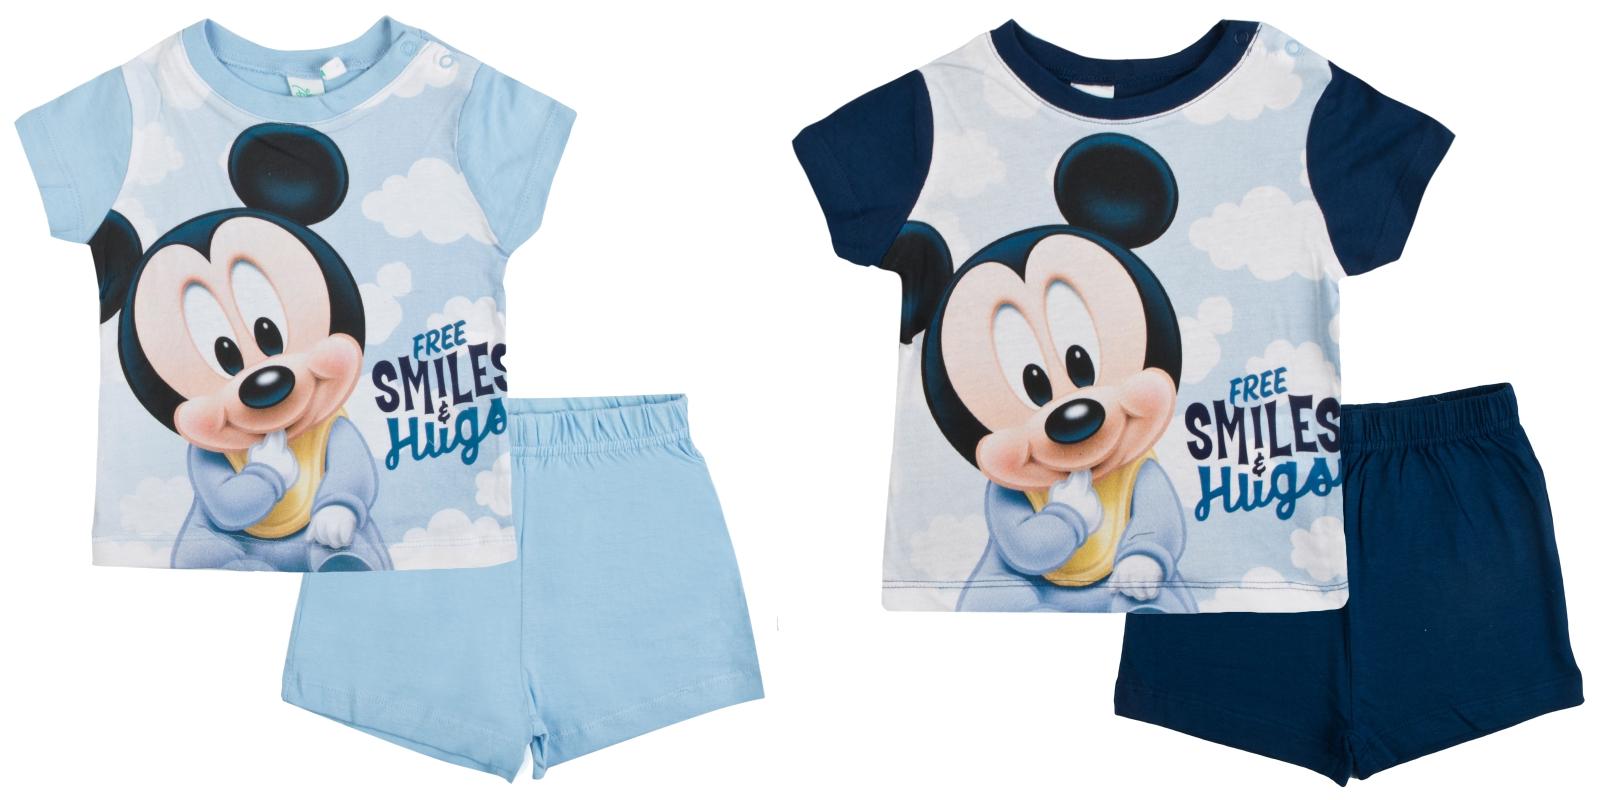 3a2dcc5bda17 Disney Mickey Mouse Baby Boys Short Pyjamas Infants Shortie Summer ...